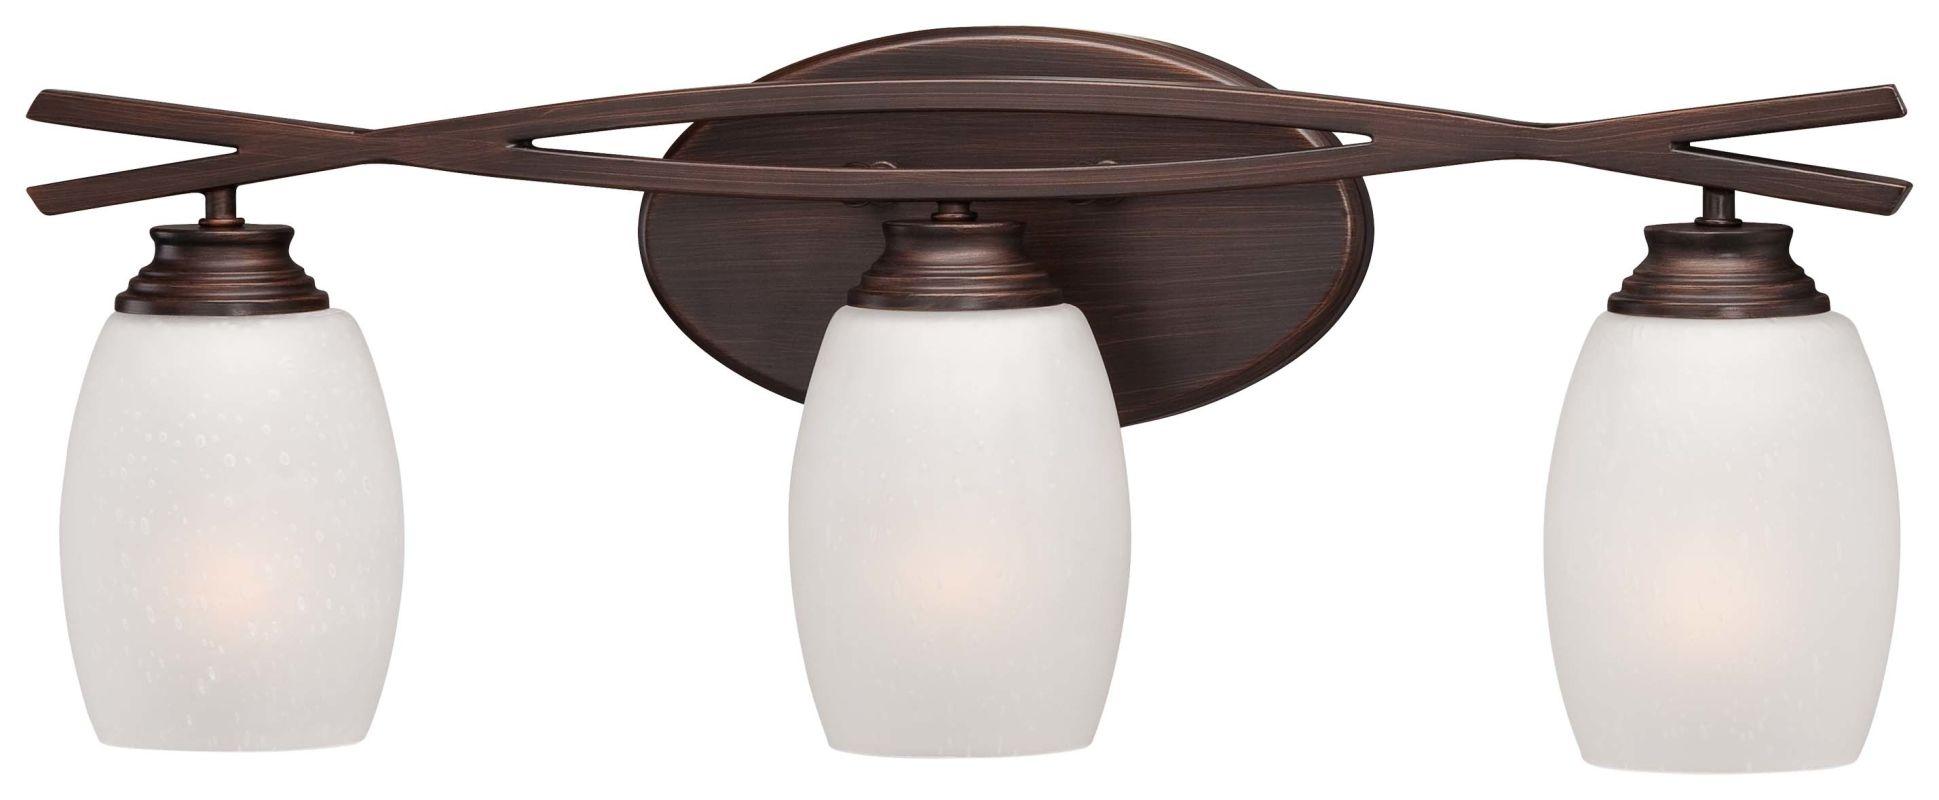 Portfolio 3 Light 22 In Brushed Nickel Bowl Vanity Light: Minka Lavery 6953-267B Dark Brushed Bronze 3 Light